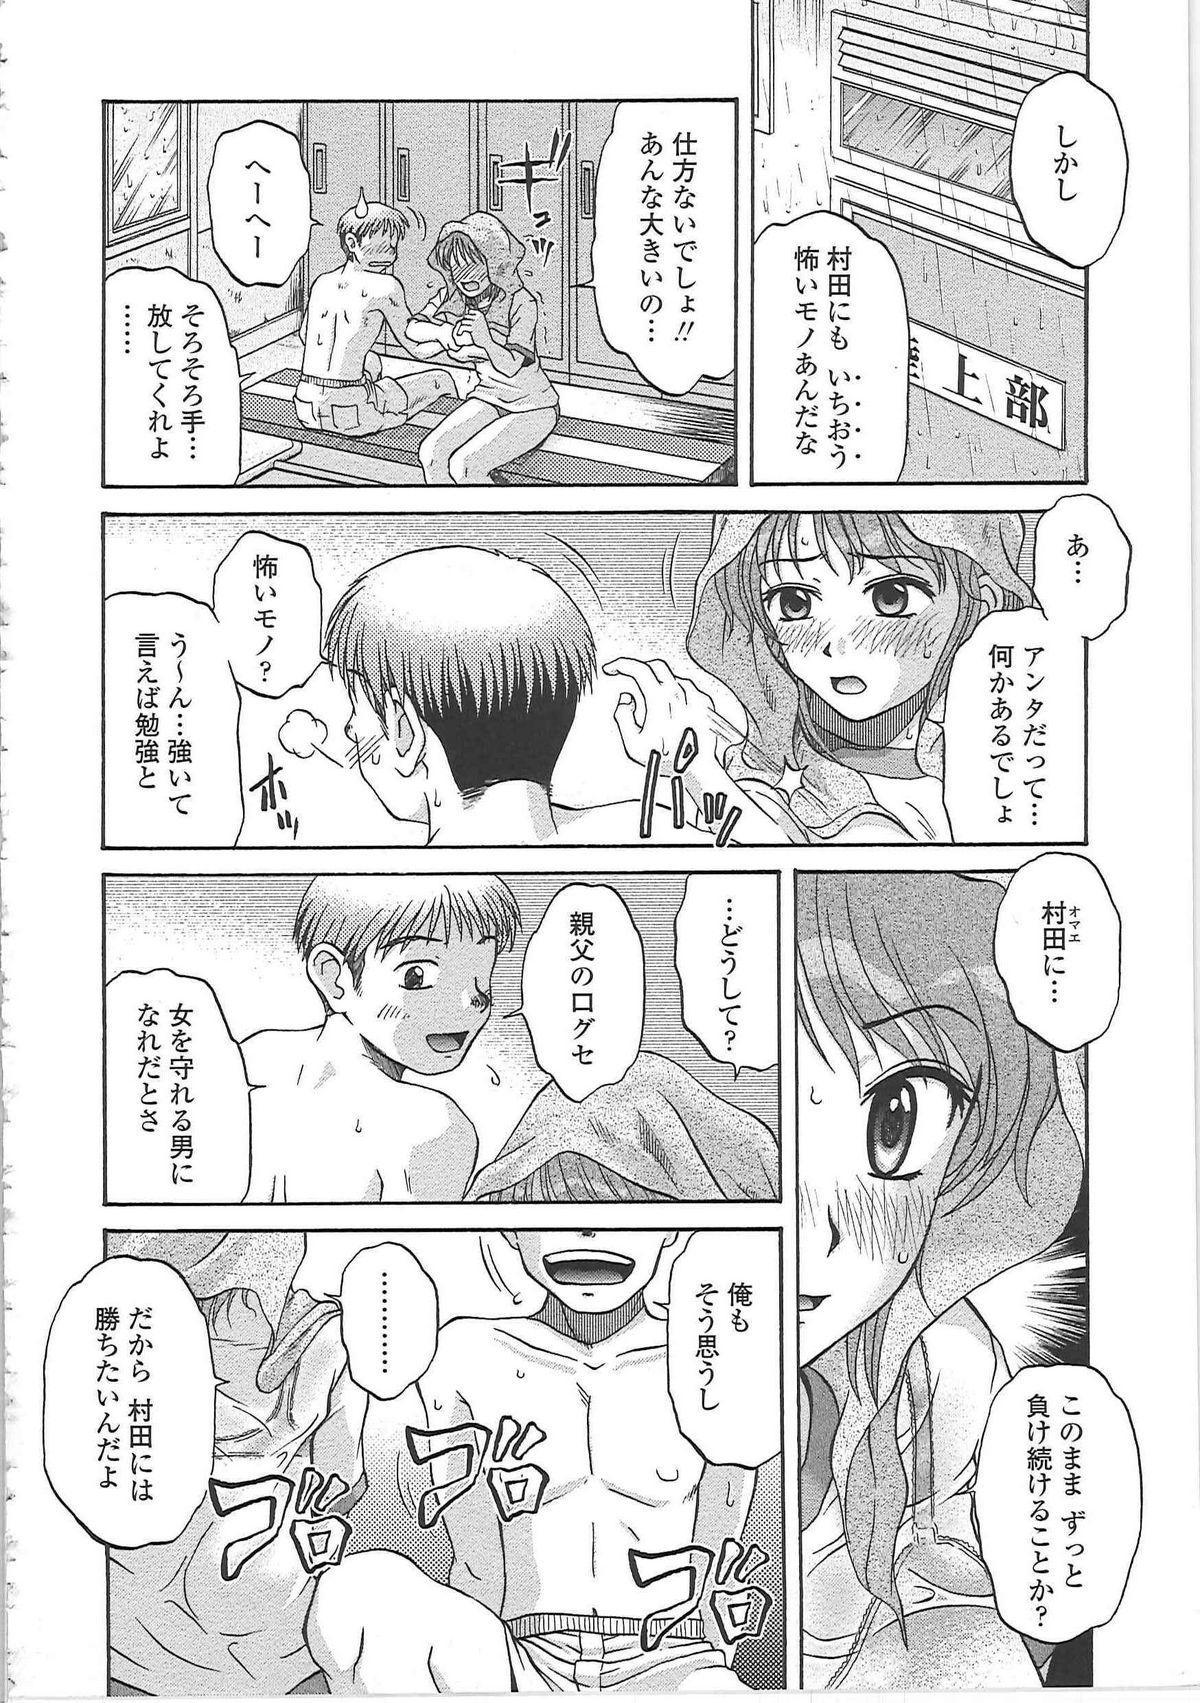 Nikuzuma Tsuushin - Erotic Wife Communication 168